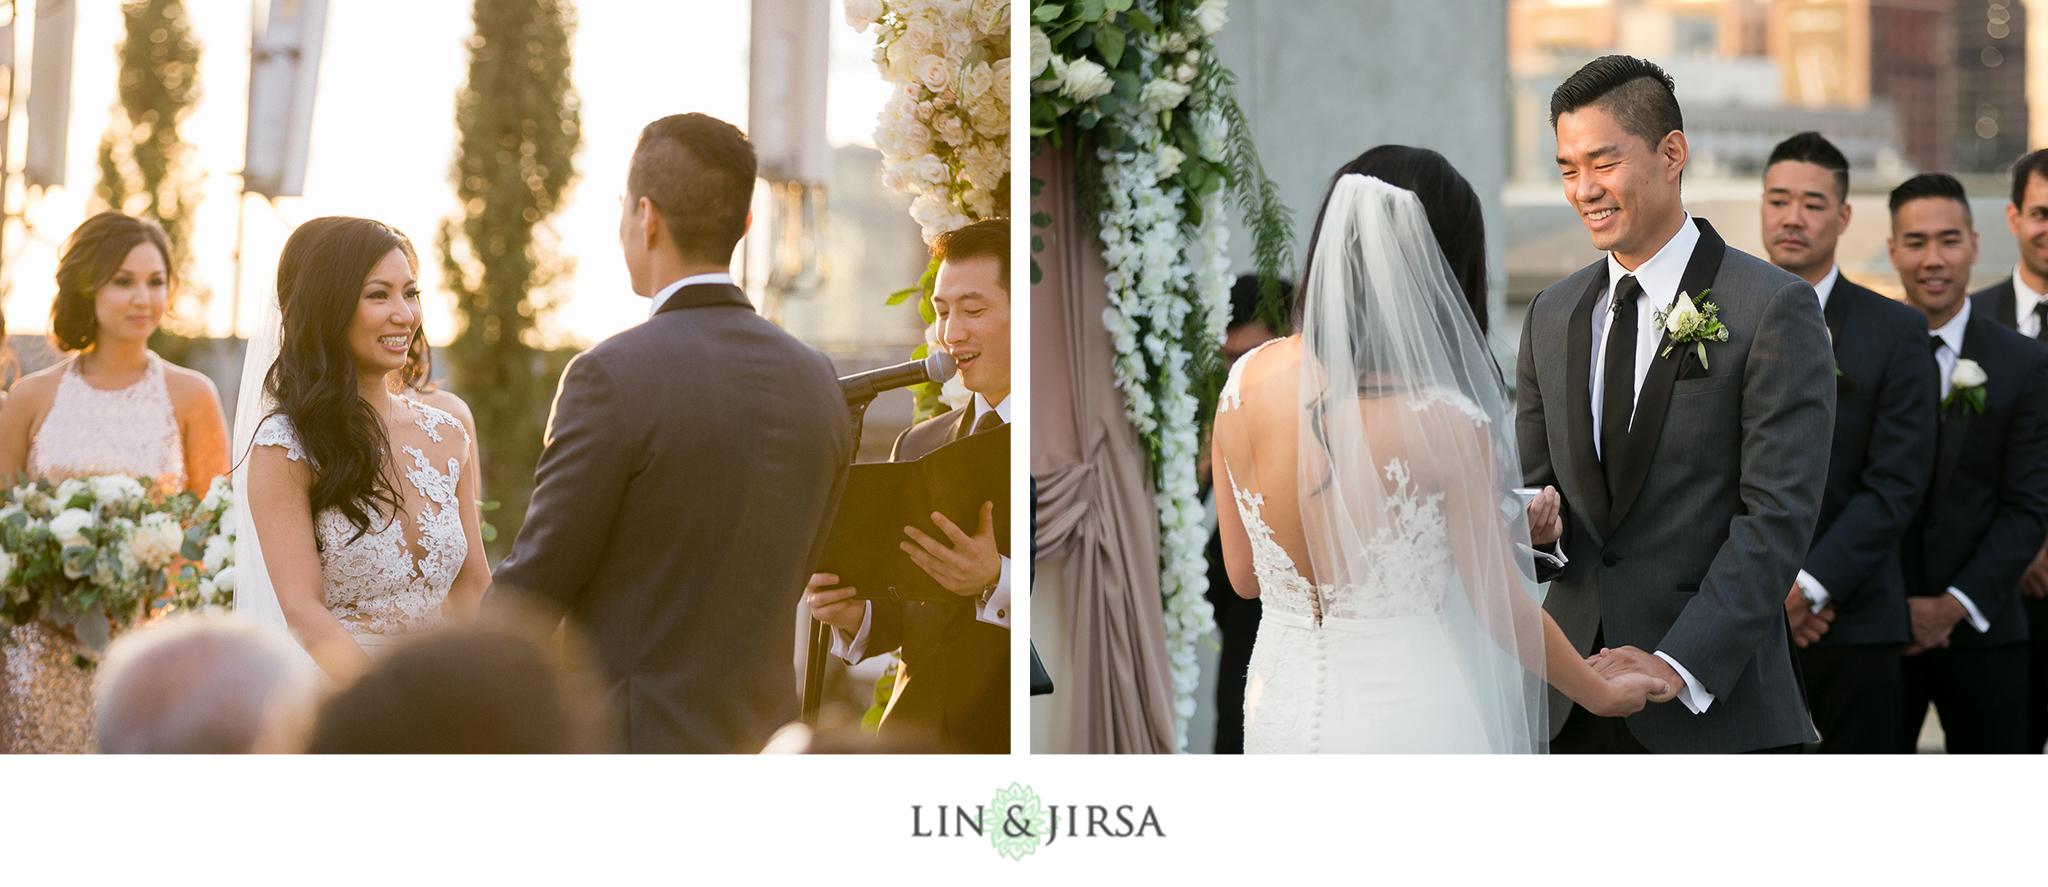 23-hudson-loft-downtown-los-angeles-wedding-photography